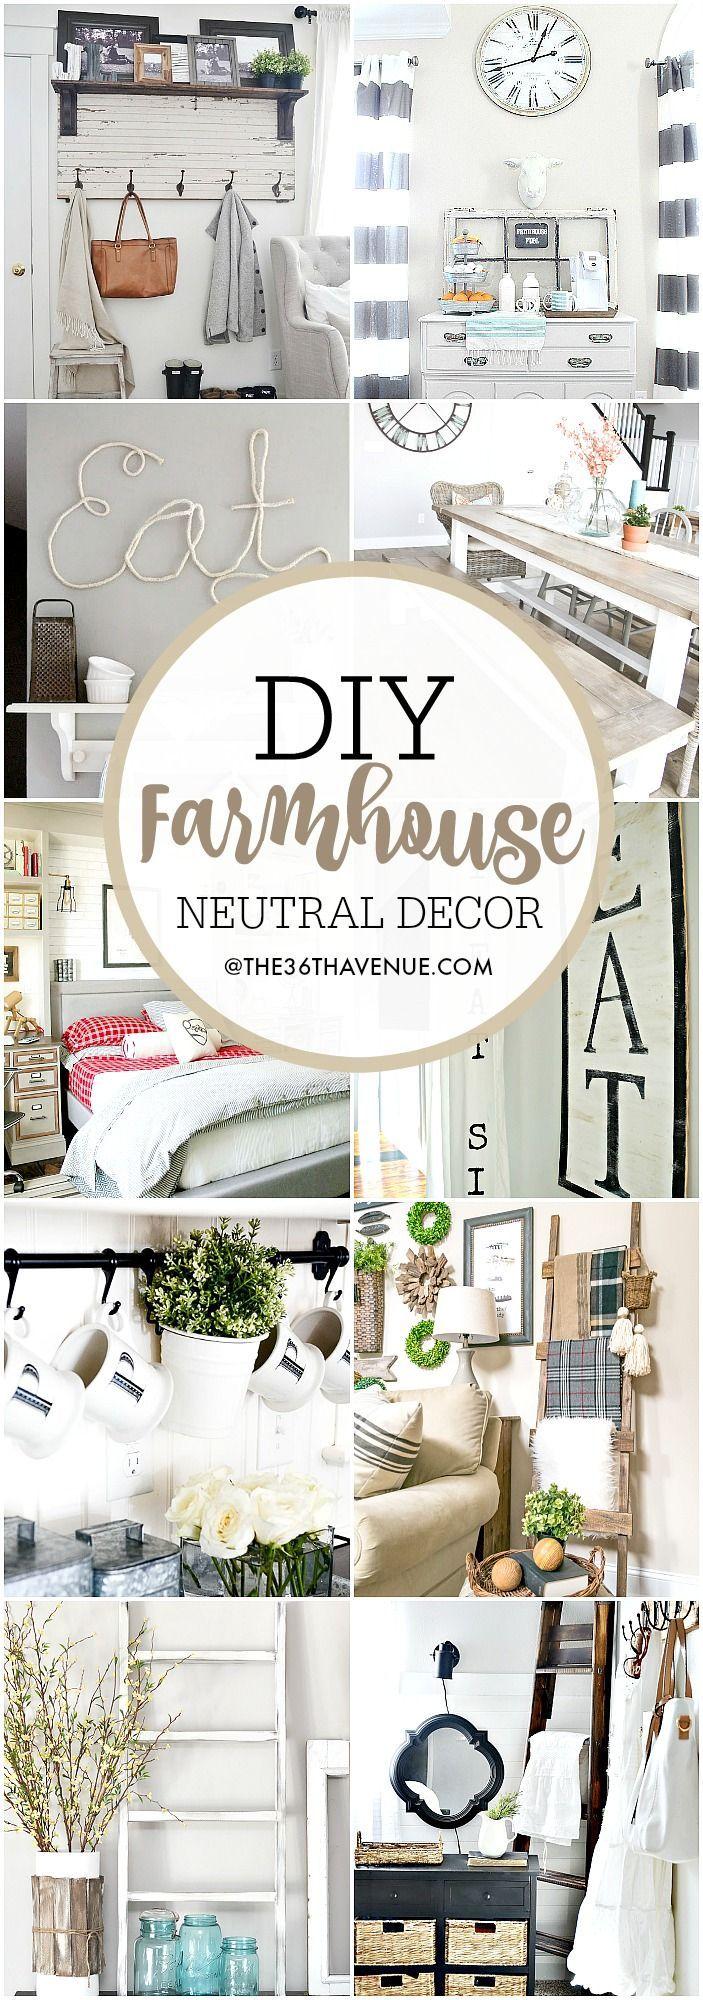 Farmhouse DIY Decor Ideas - Over 100 DIY Farmhouse Home Decor Ideas that are per...